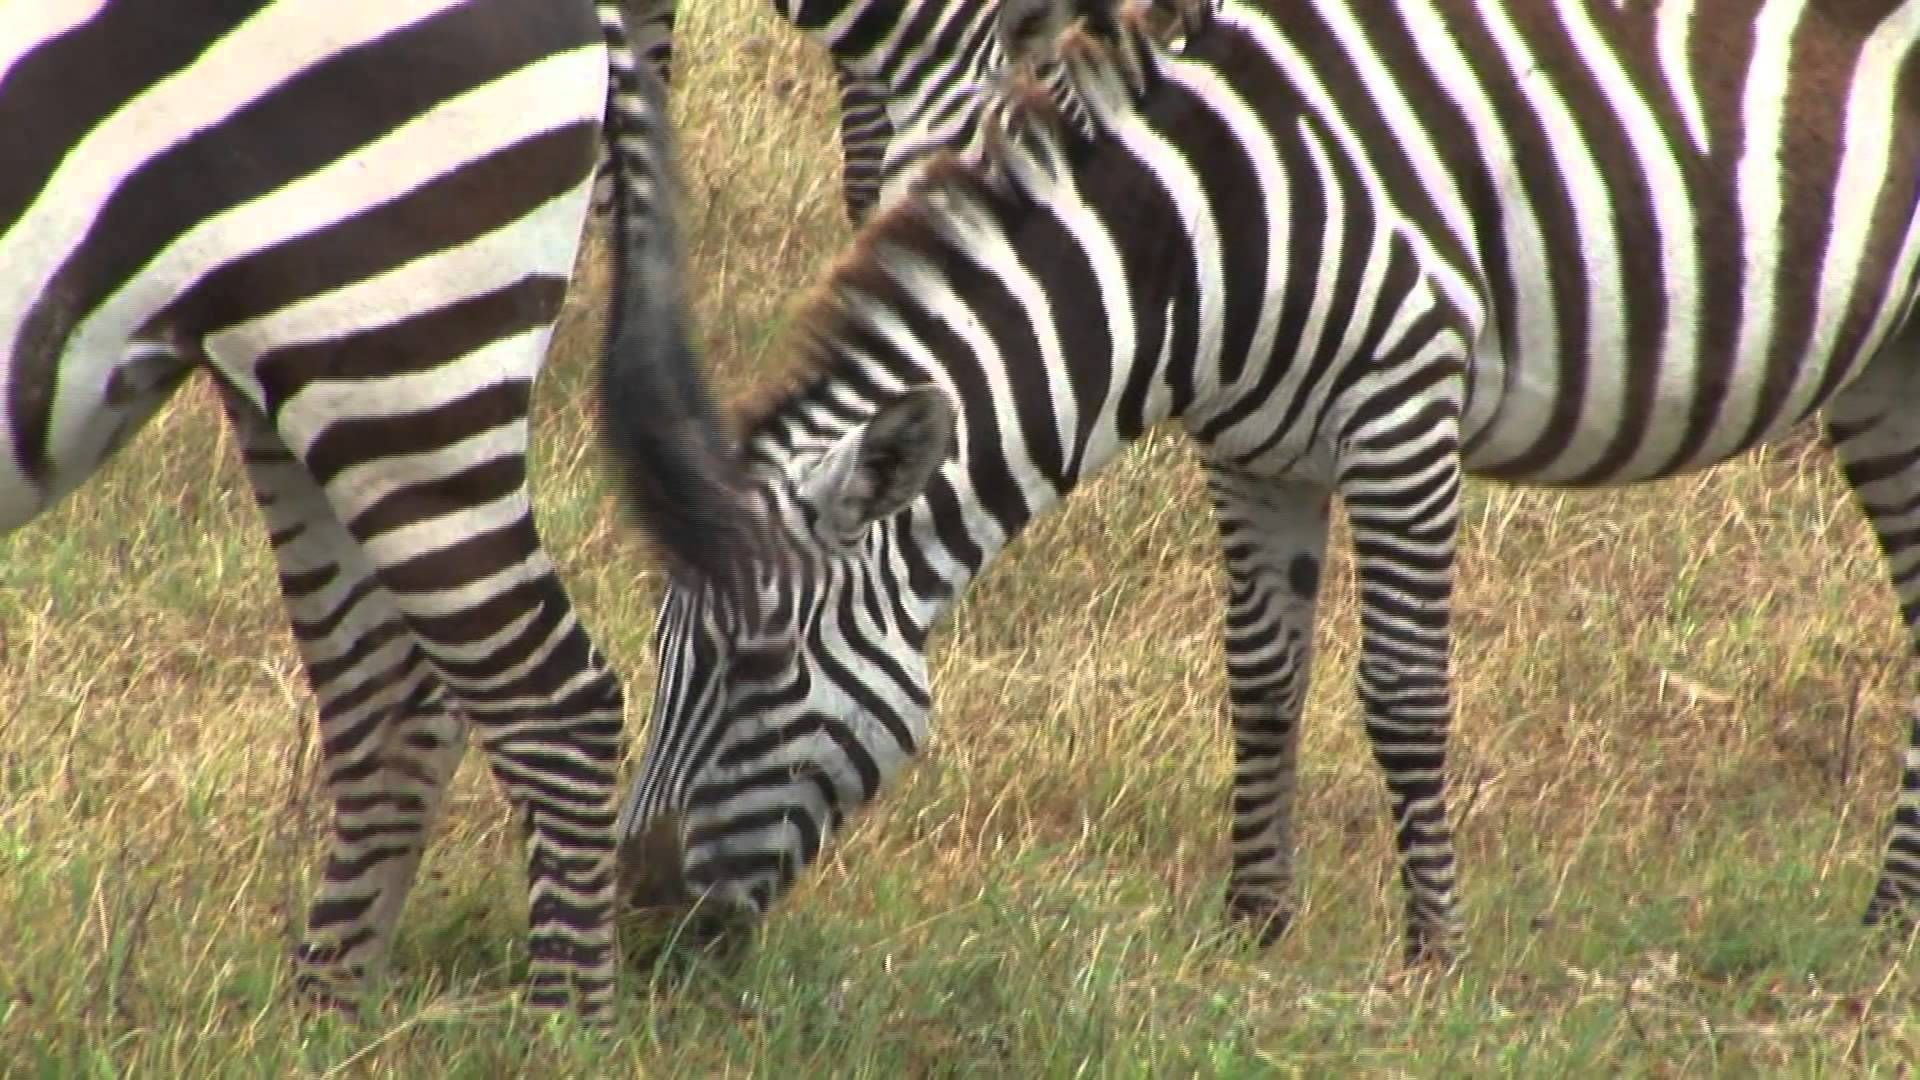 Ngorongoro Conservation Area - Tanzania - Travel & Discover #nature #nationalpark #africa #tanzania #conservation #wildlife